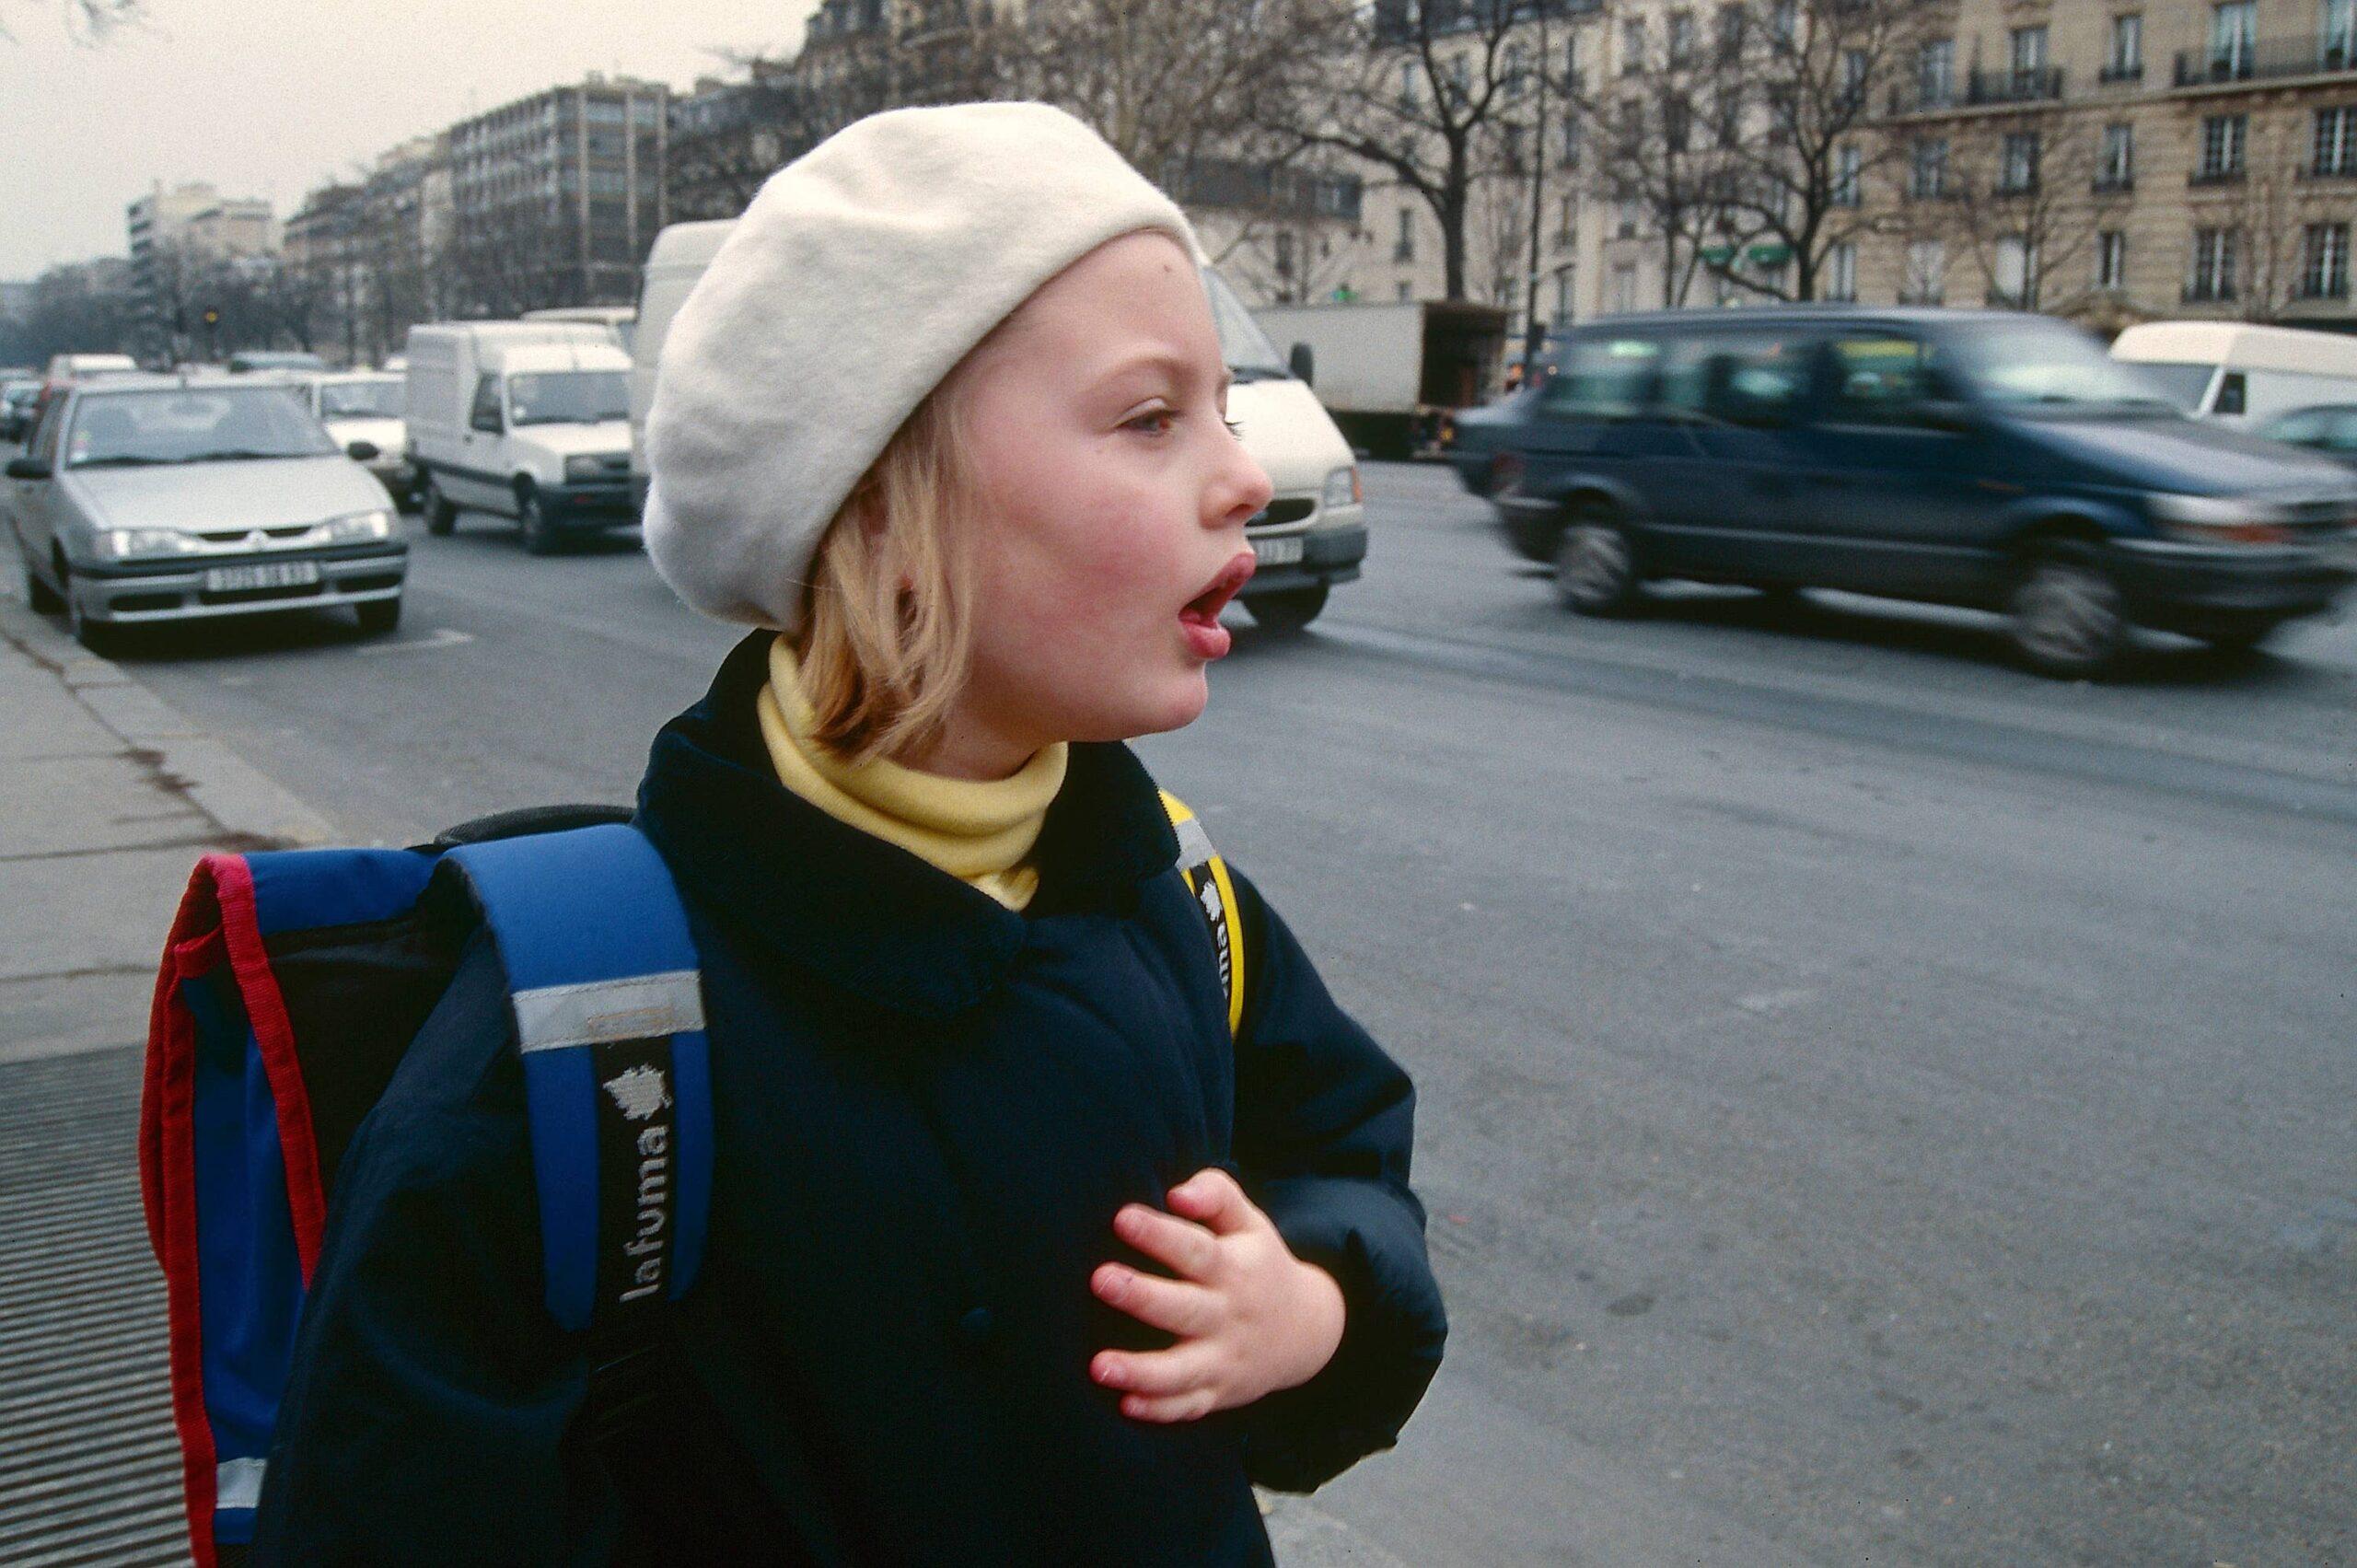 Reduce Children's Exposure To Dangerous Air Pollution